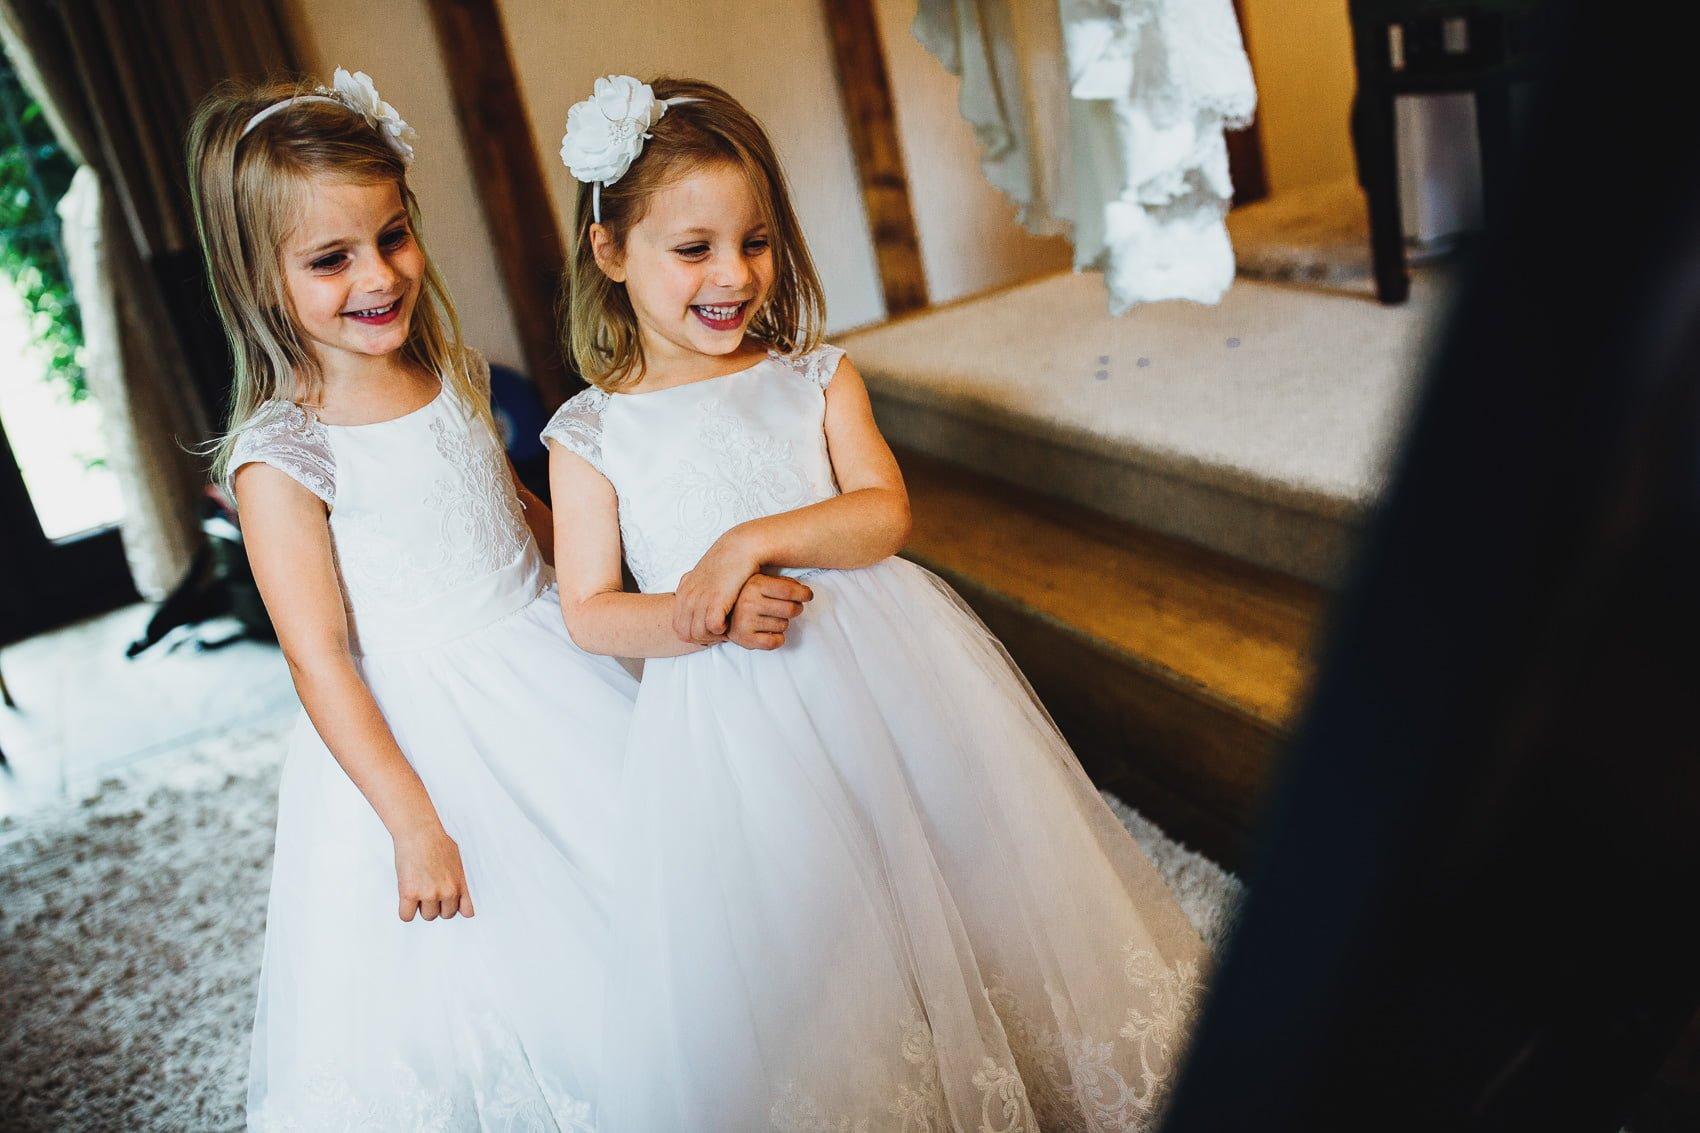 Rivervale Barn Wedding Photographer - Oli and Leyla 12